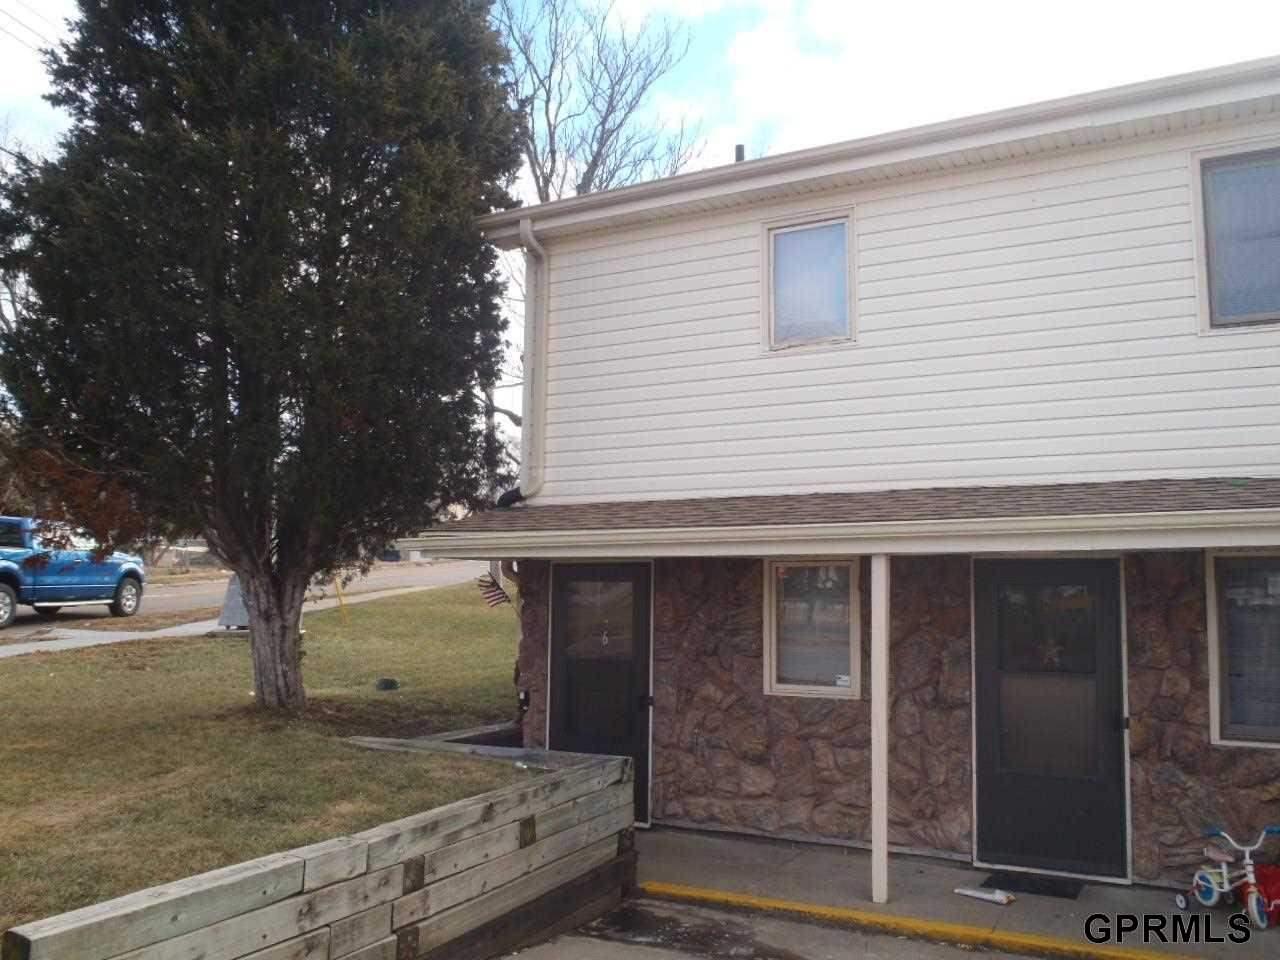 Rental Homes for Rent, ListingId:31447106, location: 302 1/2 Galvin Rd N Bellevue 68005